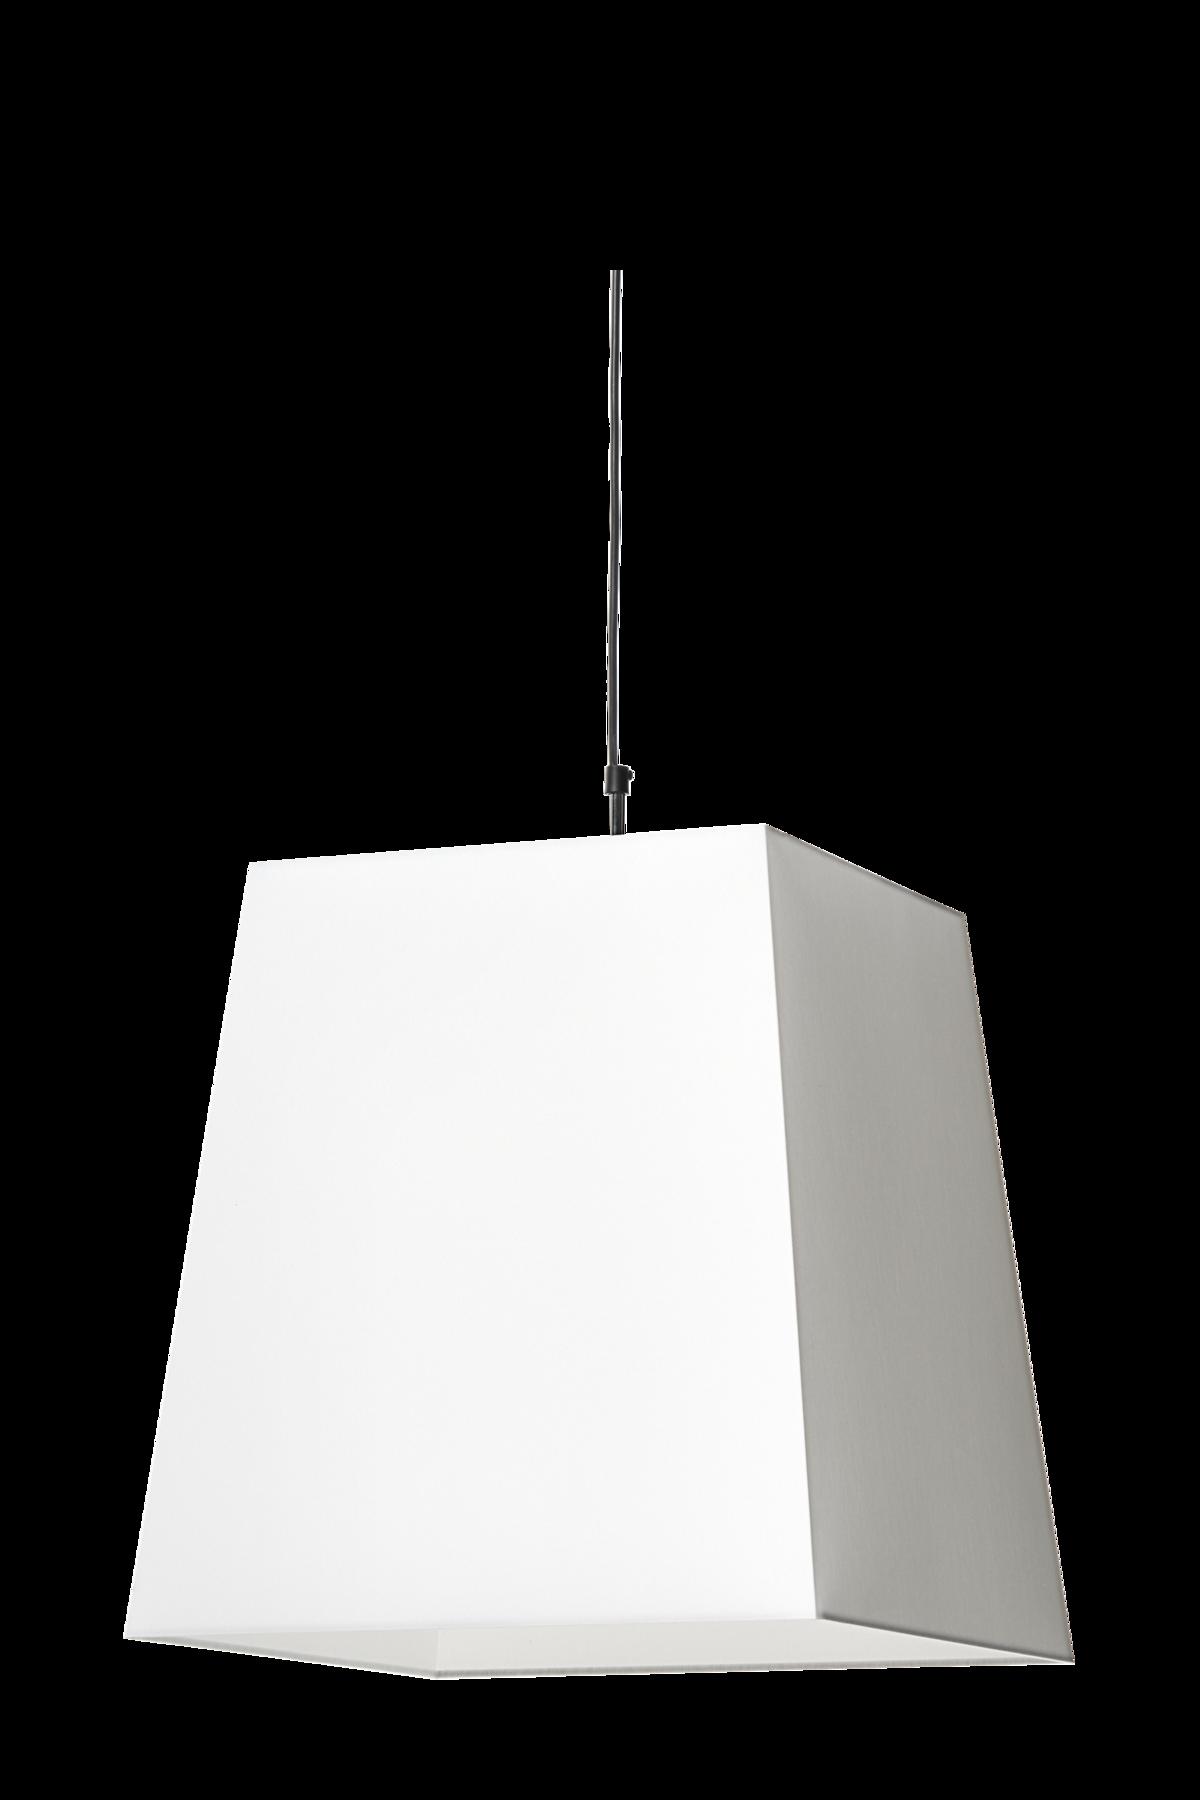 Square Light suspension front view